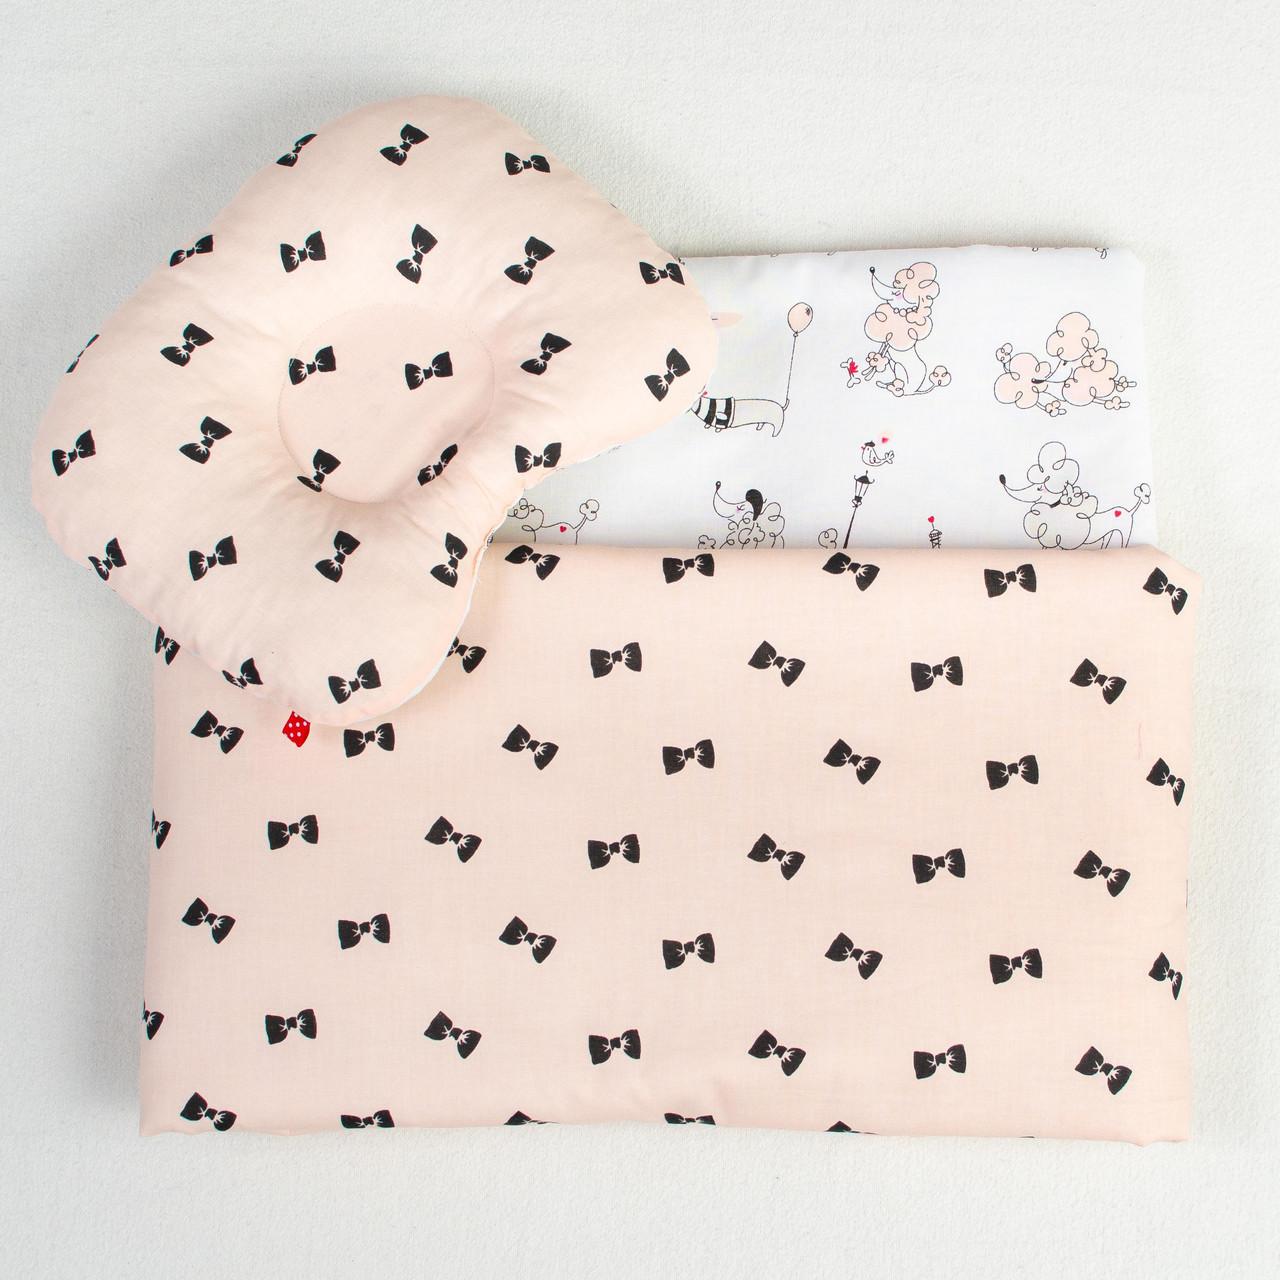 Плед - одеяло 65 х 75 см и  подушка 22 х 26 см Бантики   в коляску